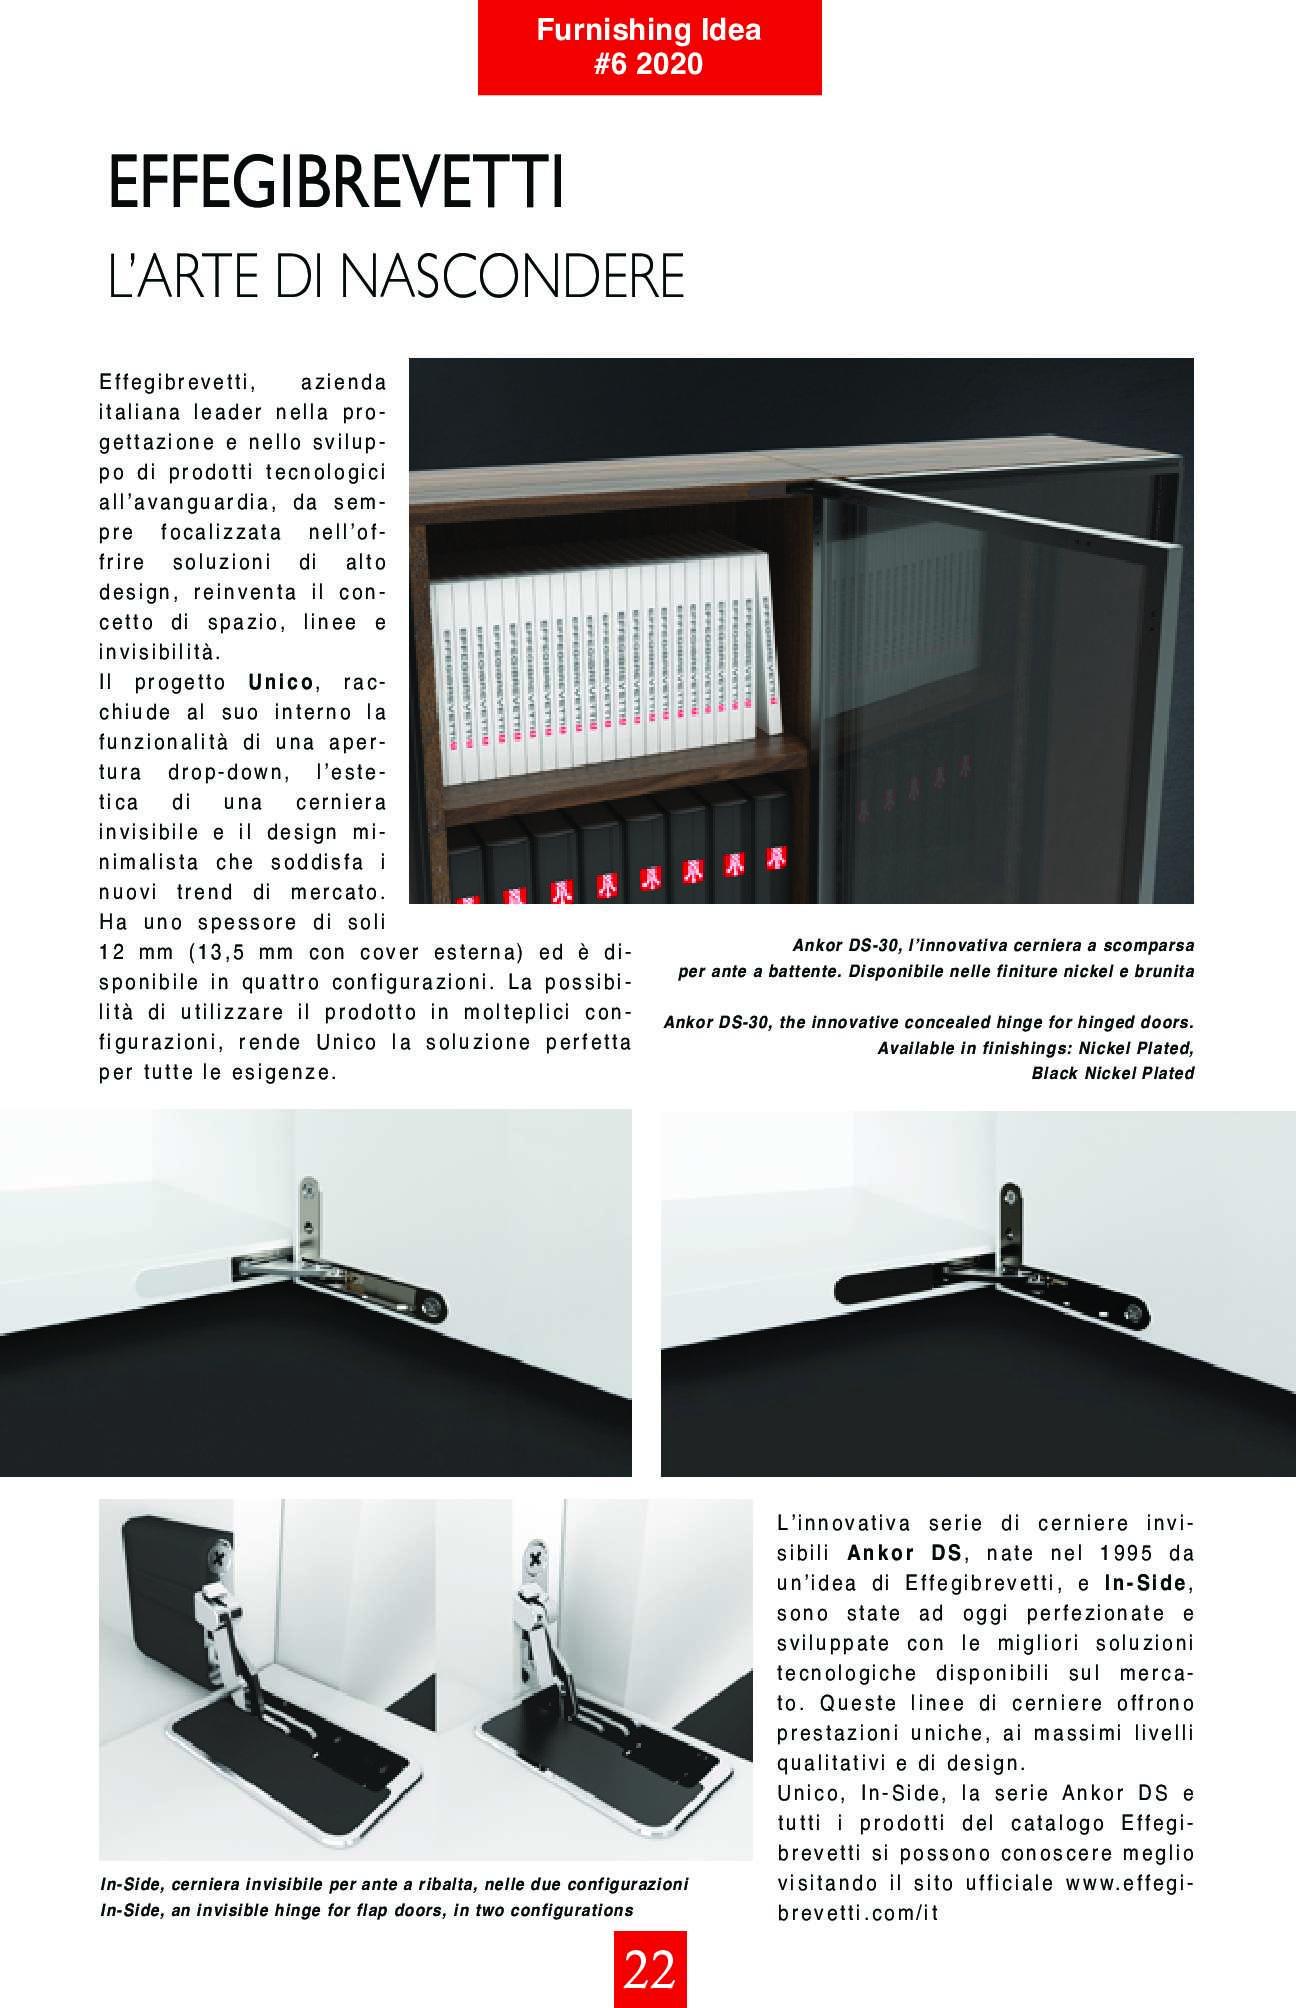 furnishingidea-6-2020_journal_22_021.jpg